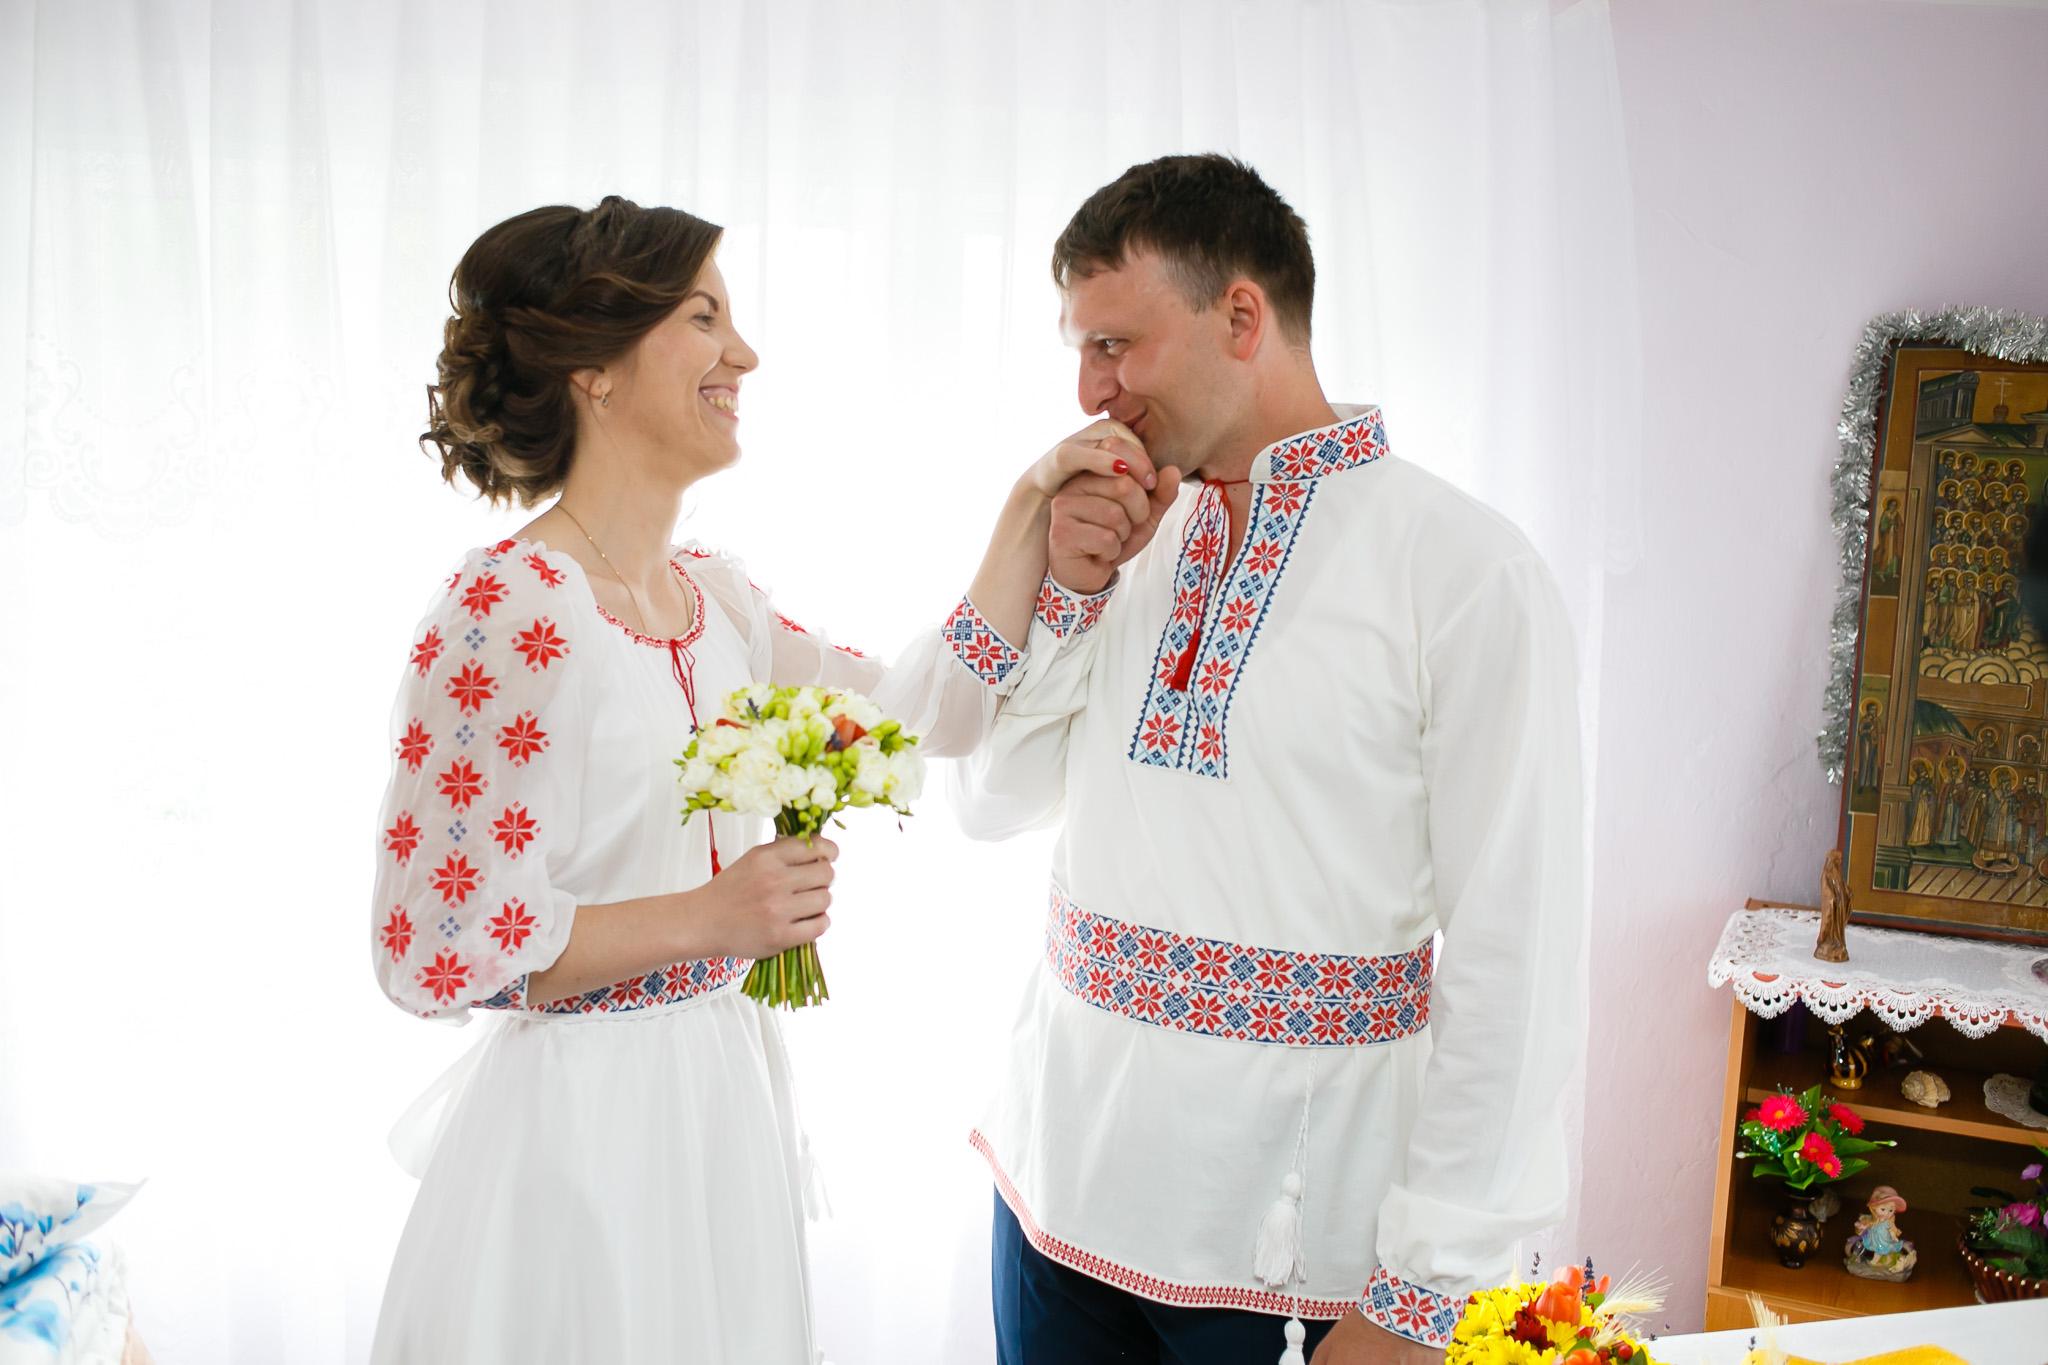 Nuntă tradițională Elisabeta și Alexandru fotograf profesionist nunta Iasi www.paulpadurariu.ro © 2018 Paul Padurariu pregatiri miri 5